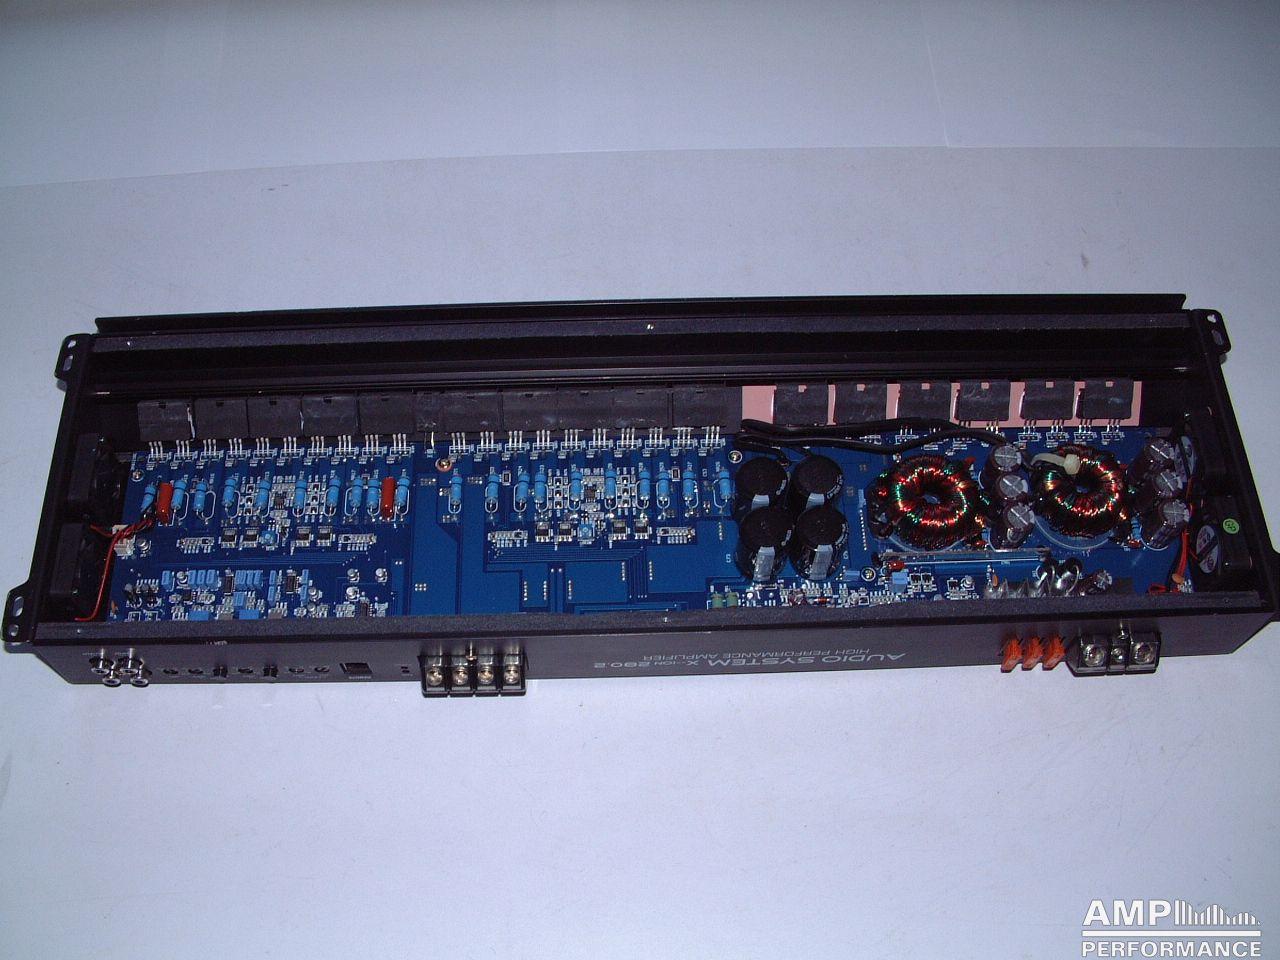 audio system x ion 280 2 amp performance. Black Bedroom Furniture Sets. Home Design Ideas